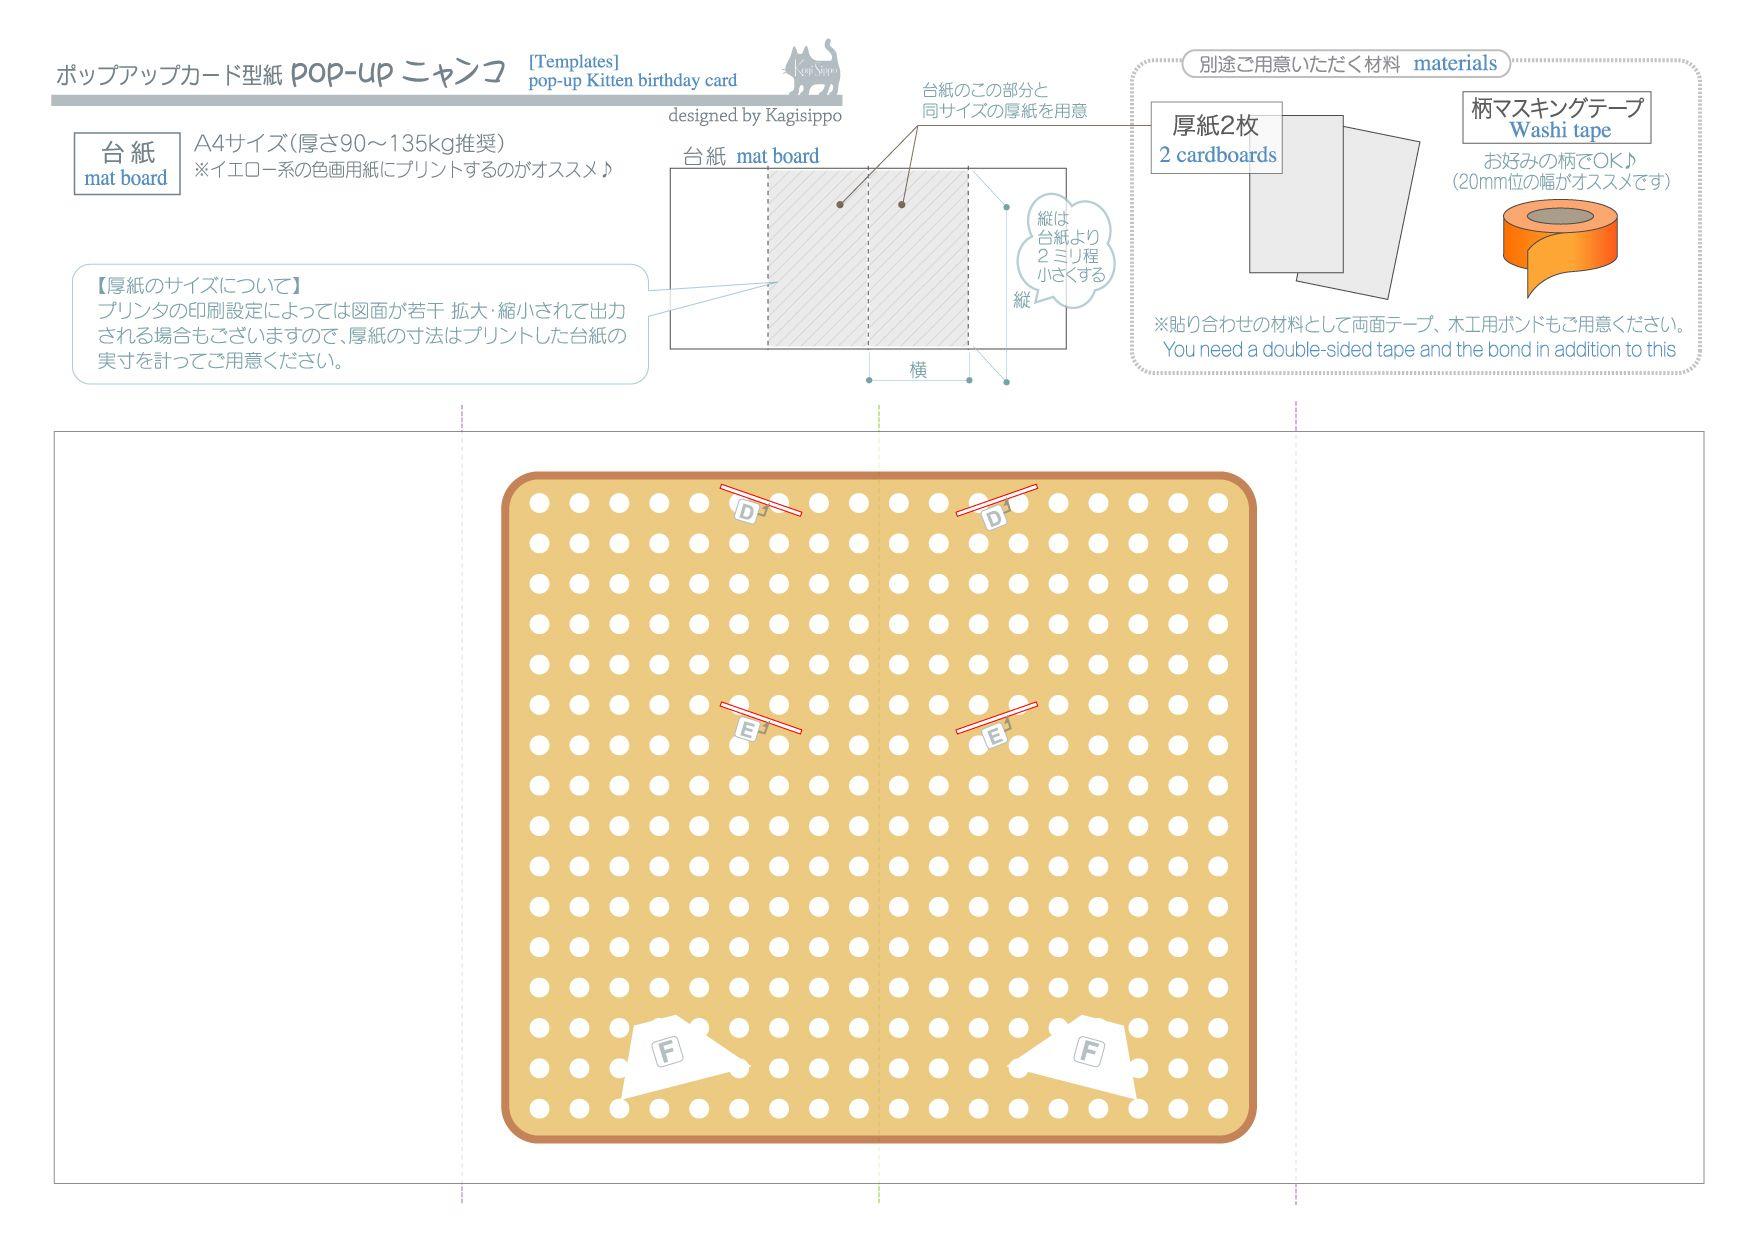 Free Ptn Cat2 Jpg 1 754 1 240 Pixels Pop Up Card Templates Pop Up Cards Flower Birthday Cards